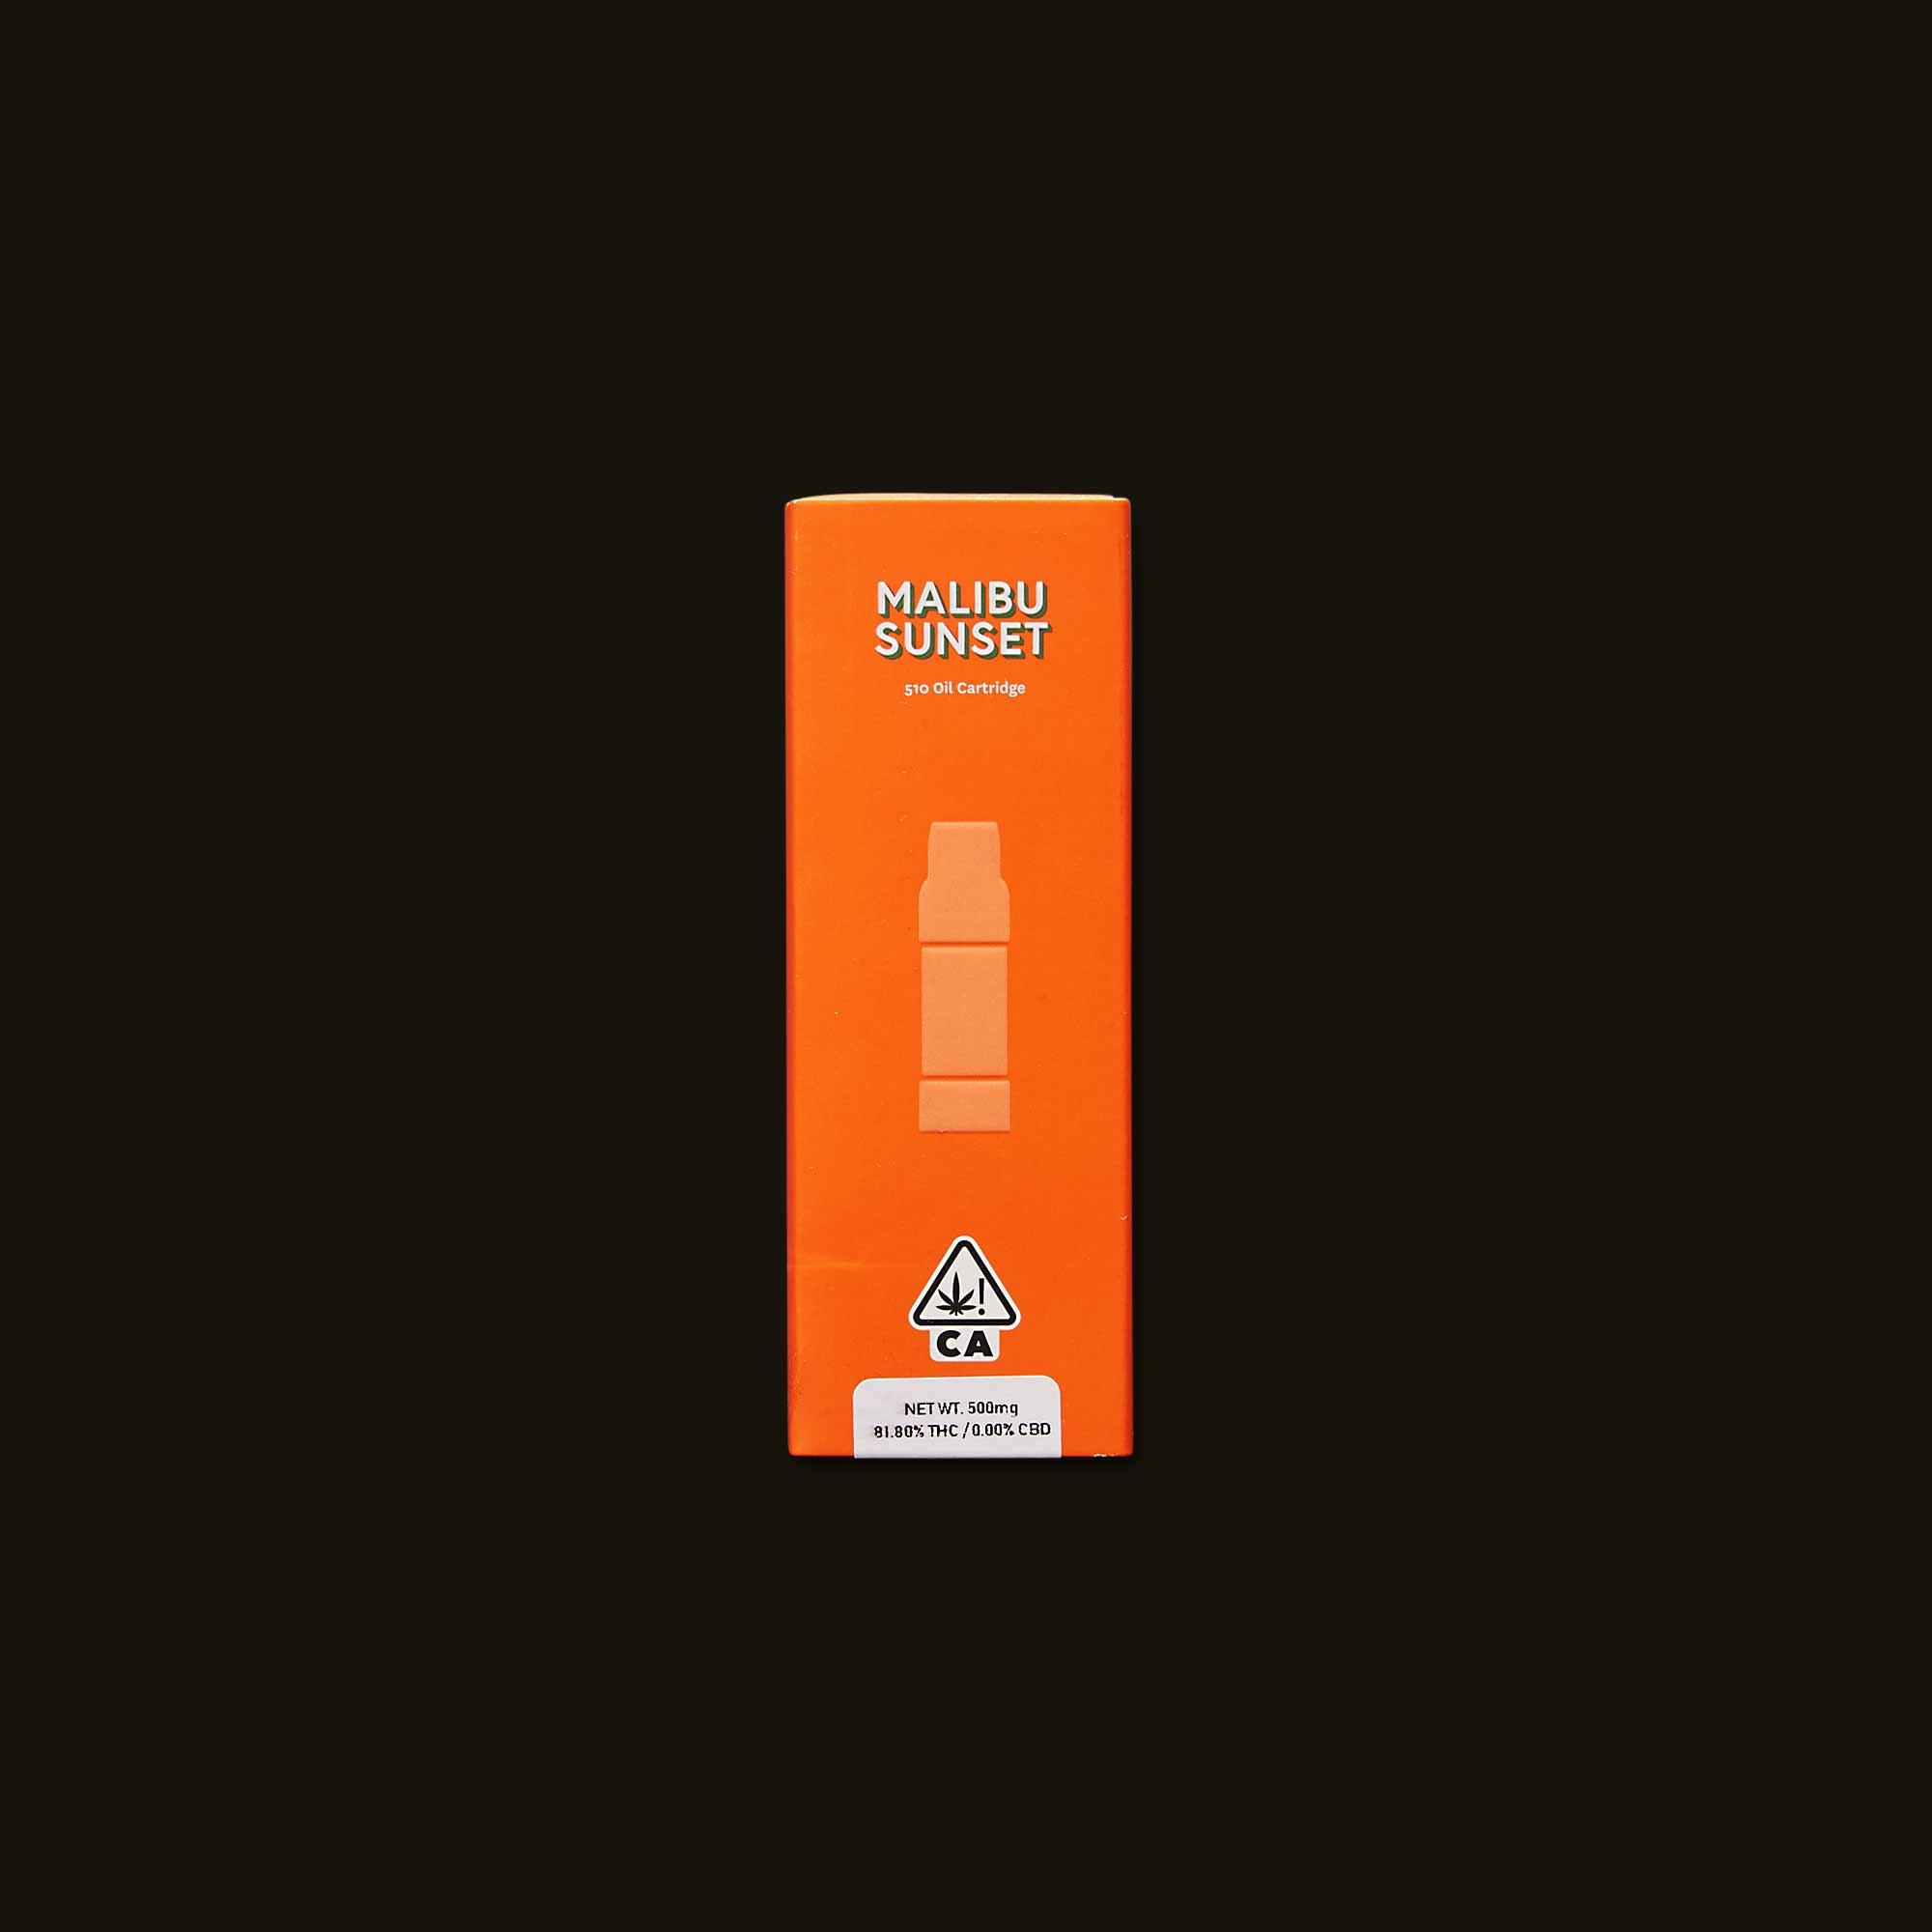 Malibu Sunset Cartridge - 500mg cartridge, 1g cartridge